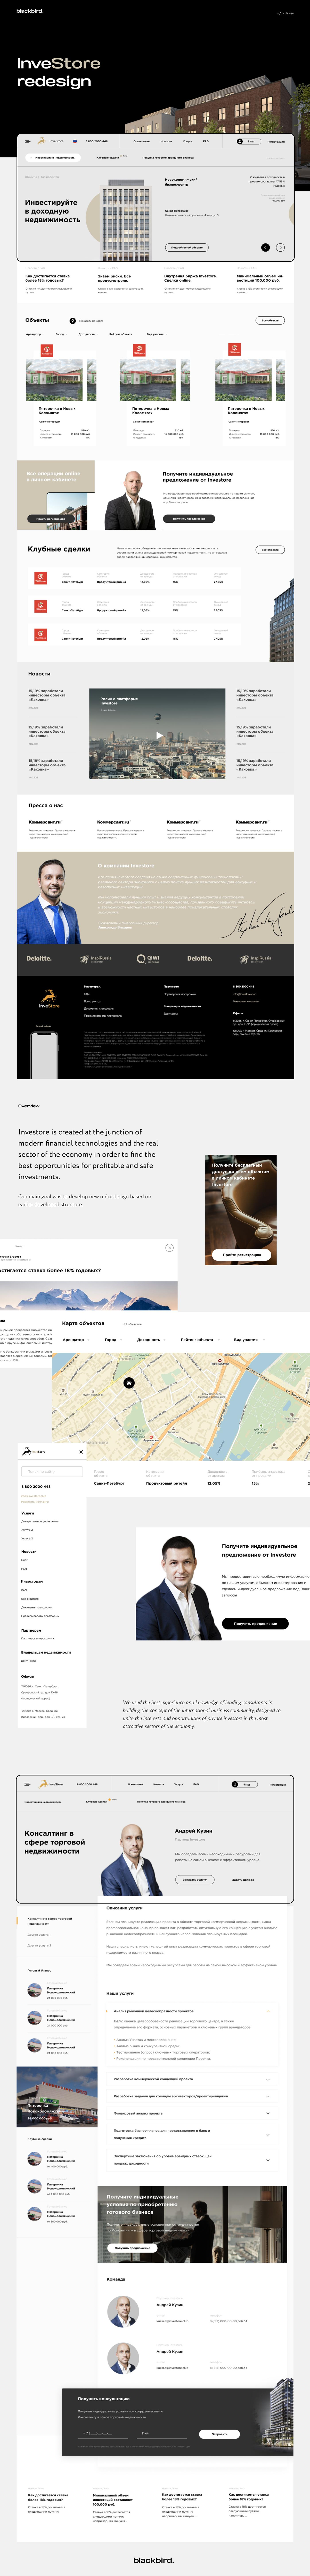 UI UX design corporate website Investments modern blockchain